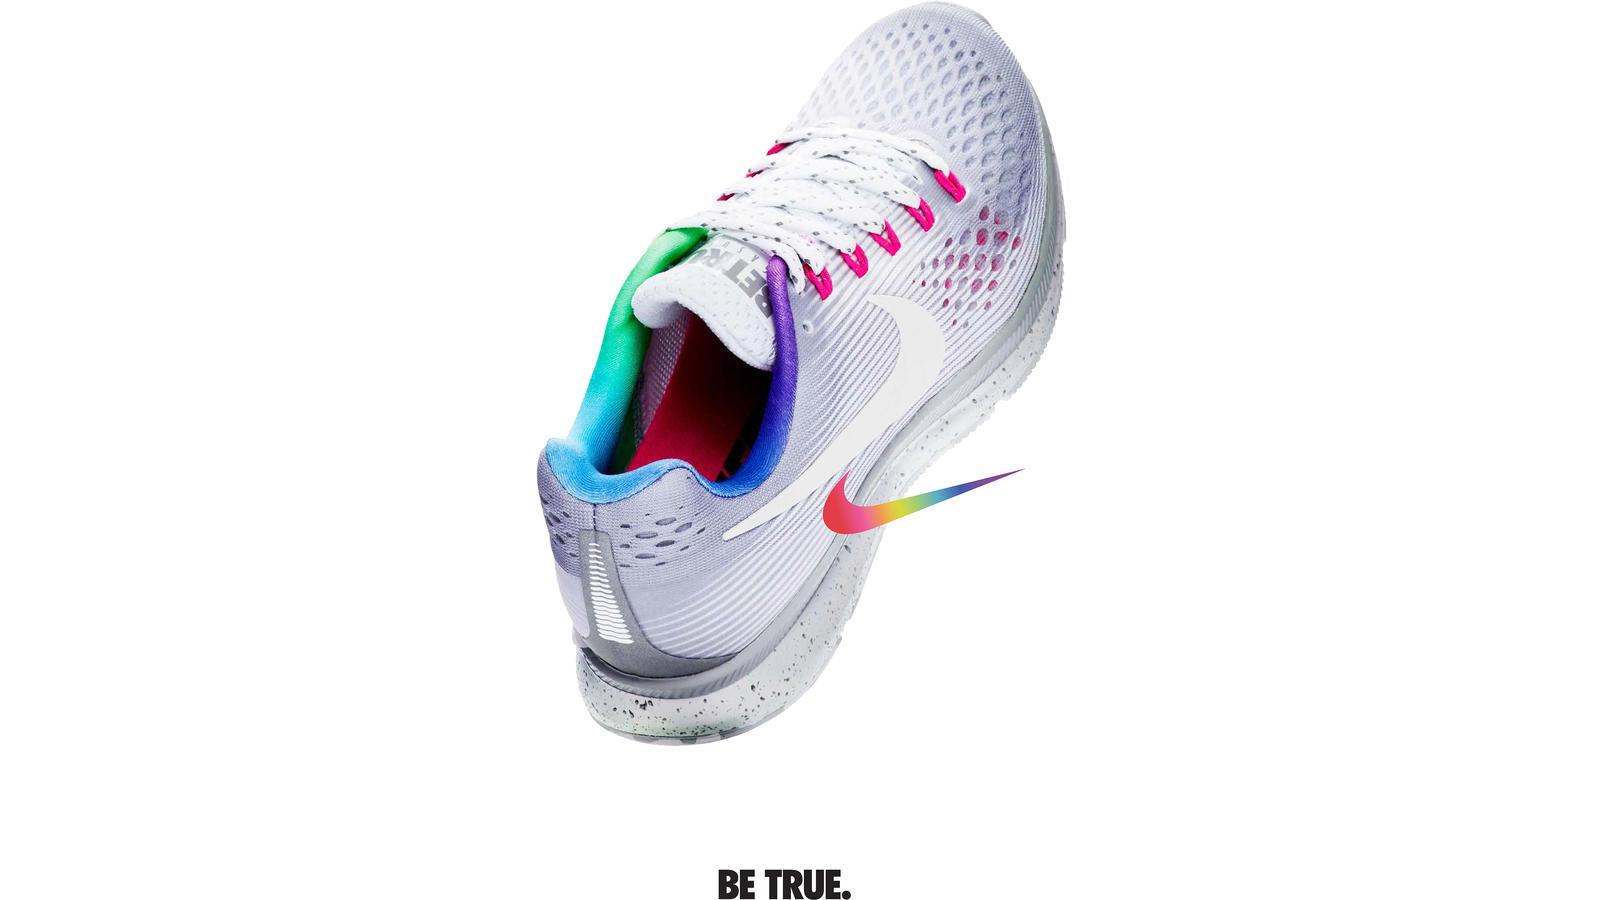 BETRUE 2017 Nike News